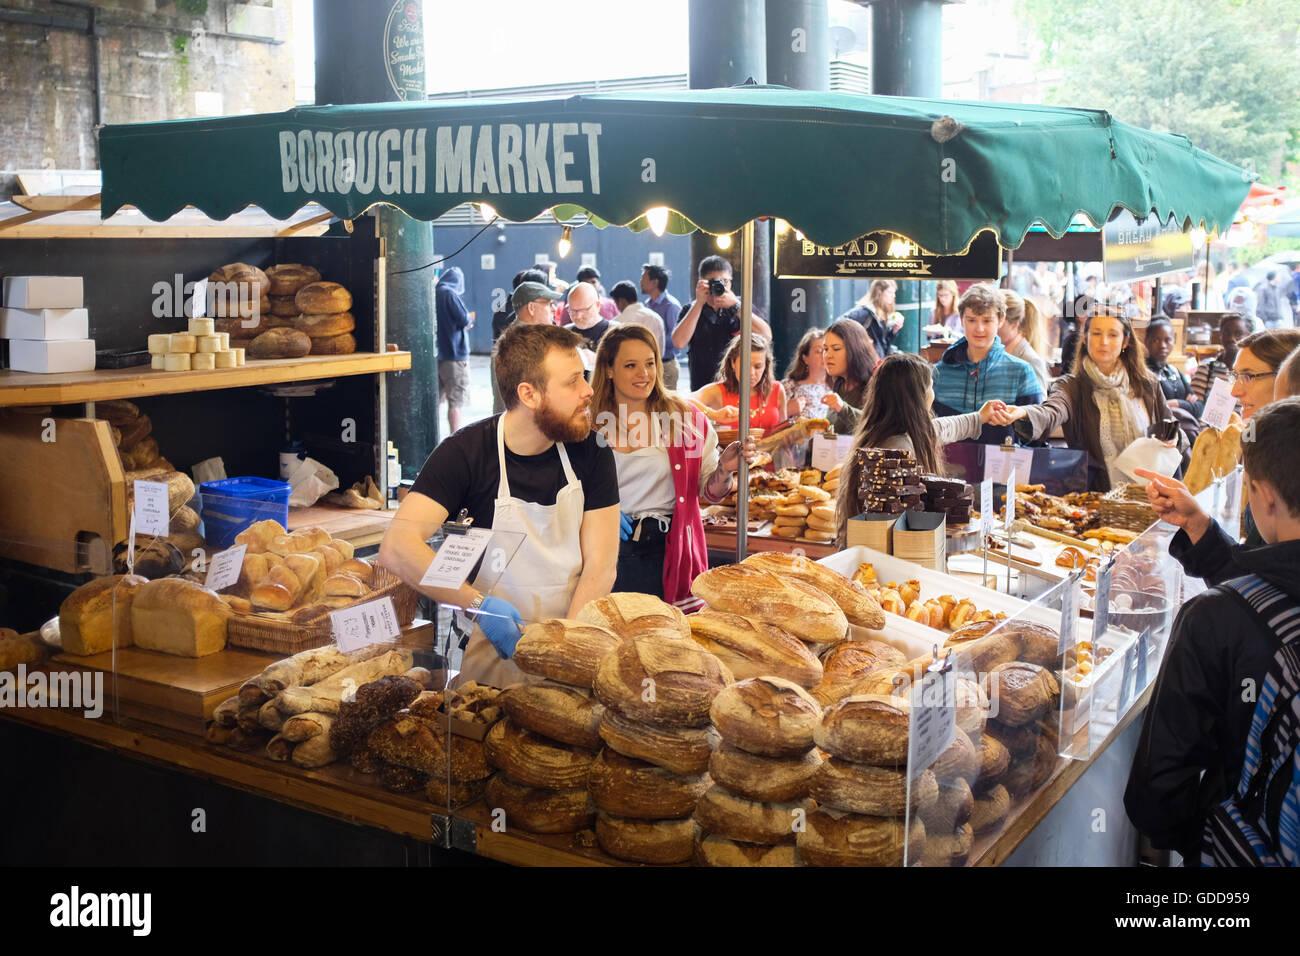 Borough Market in London, England. - Stock Image